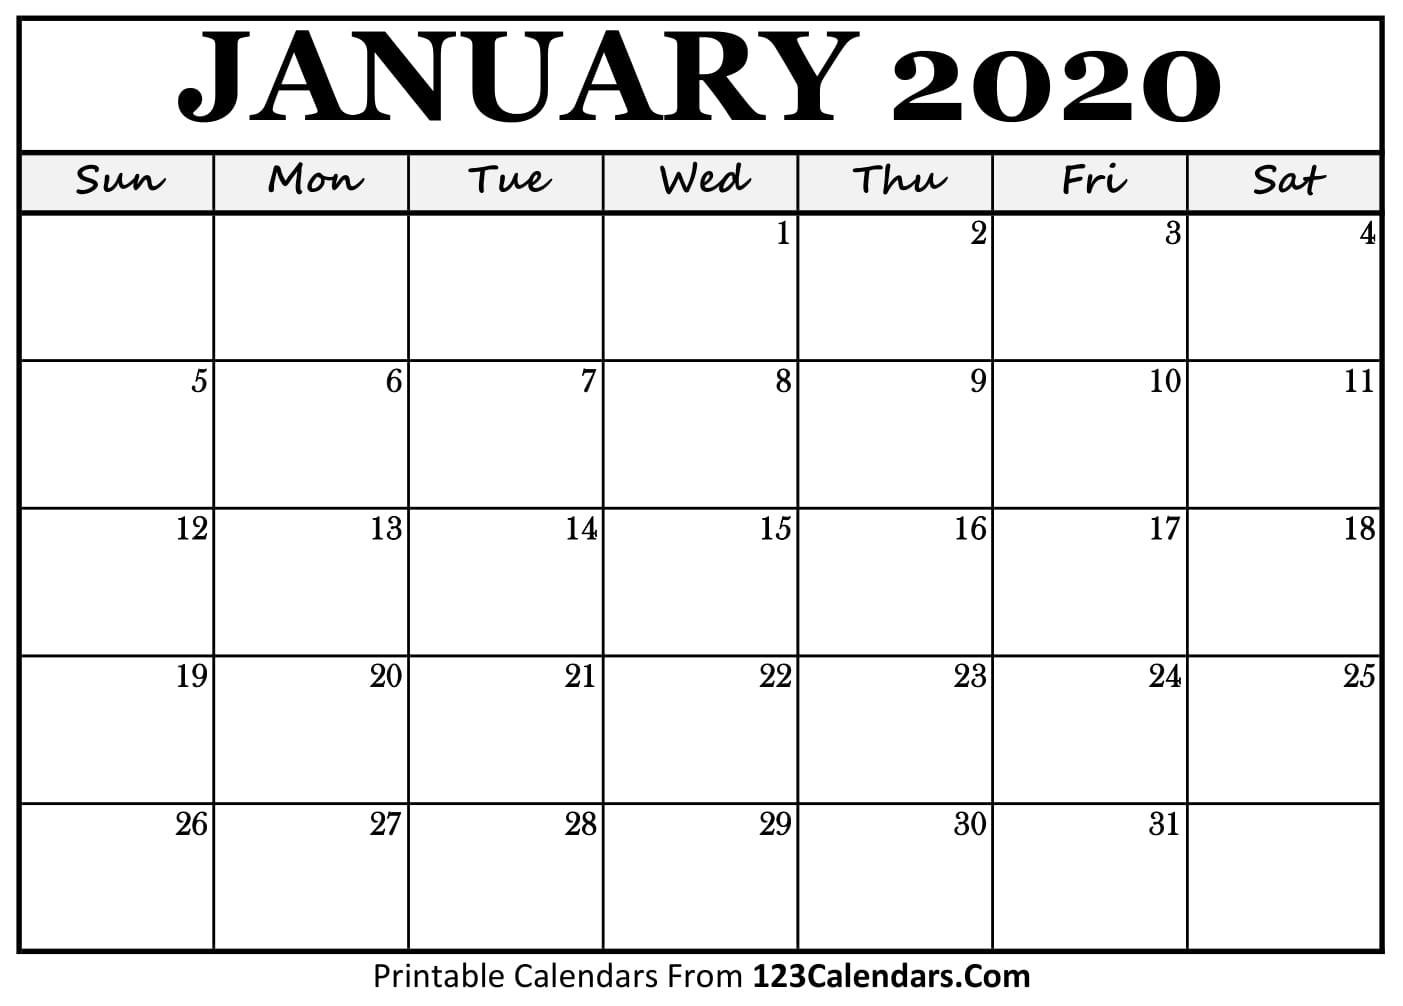 Free Printable Editable Calendars 2020 – Template Calendar